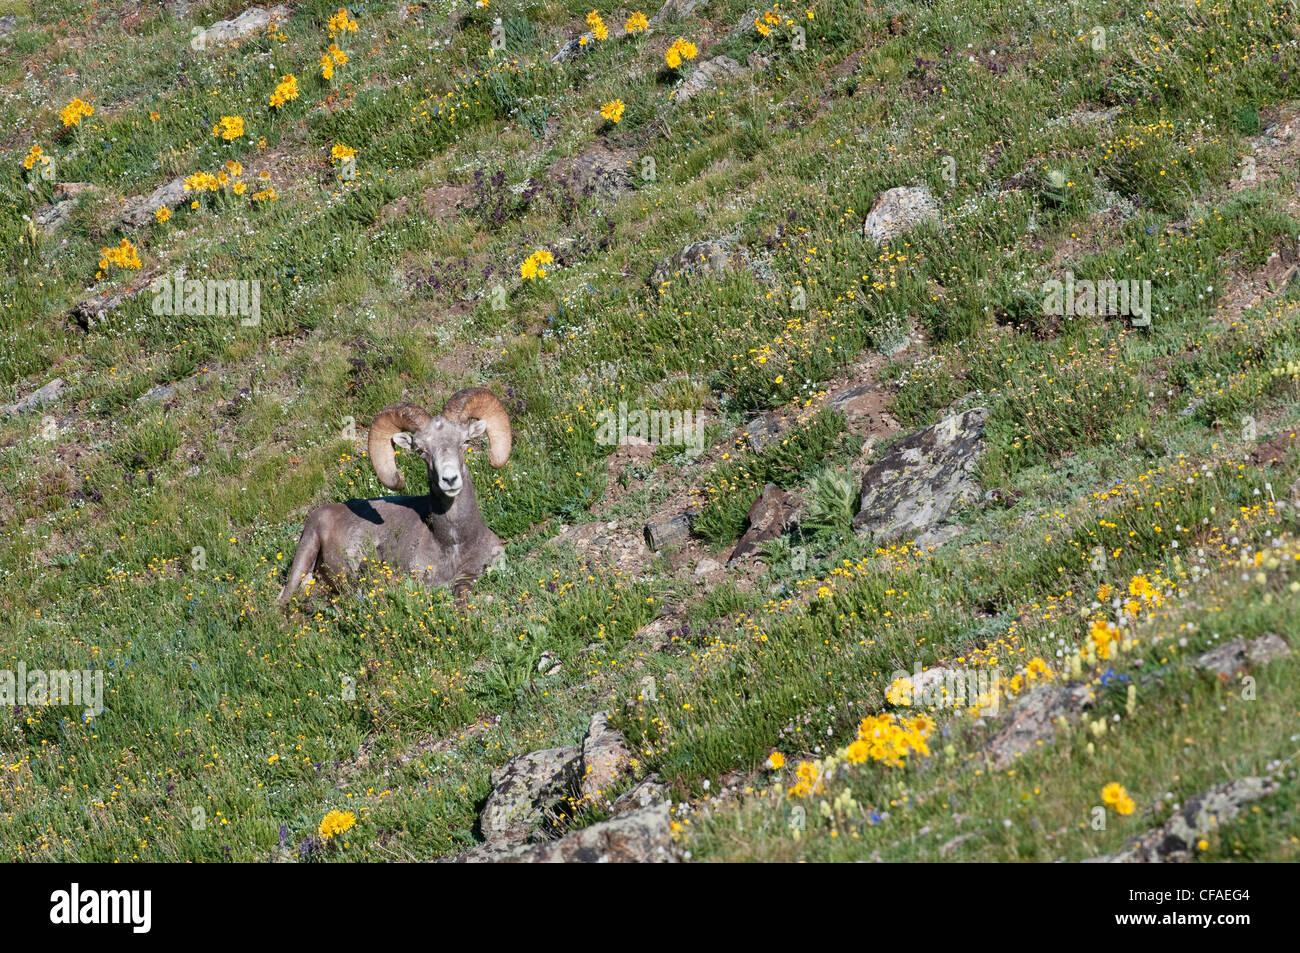 Bighorn sheep (Ovis canadensis), ram, among alpine wildflowers, Rocky Mountain National Park, Colorado. - Stock Image